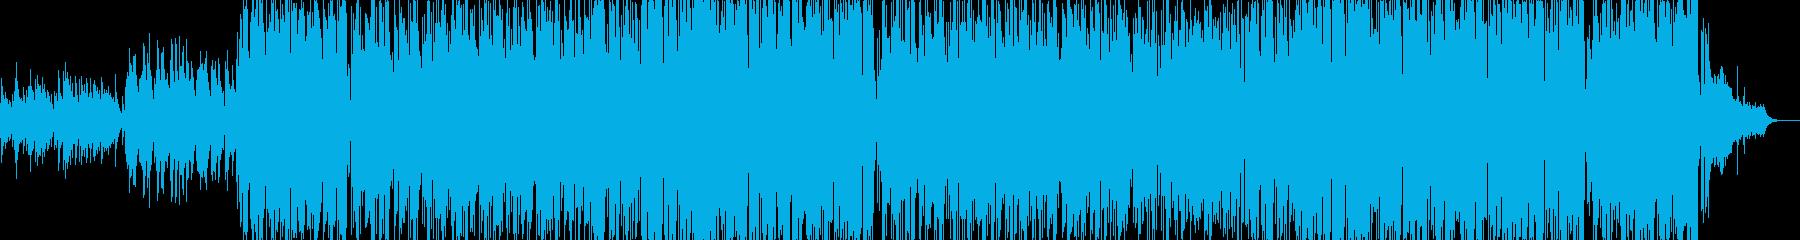 JPOPのカラオケのようなPOP曲の再生済みの波形